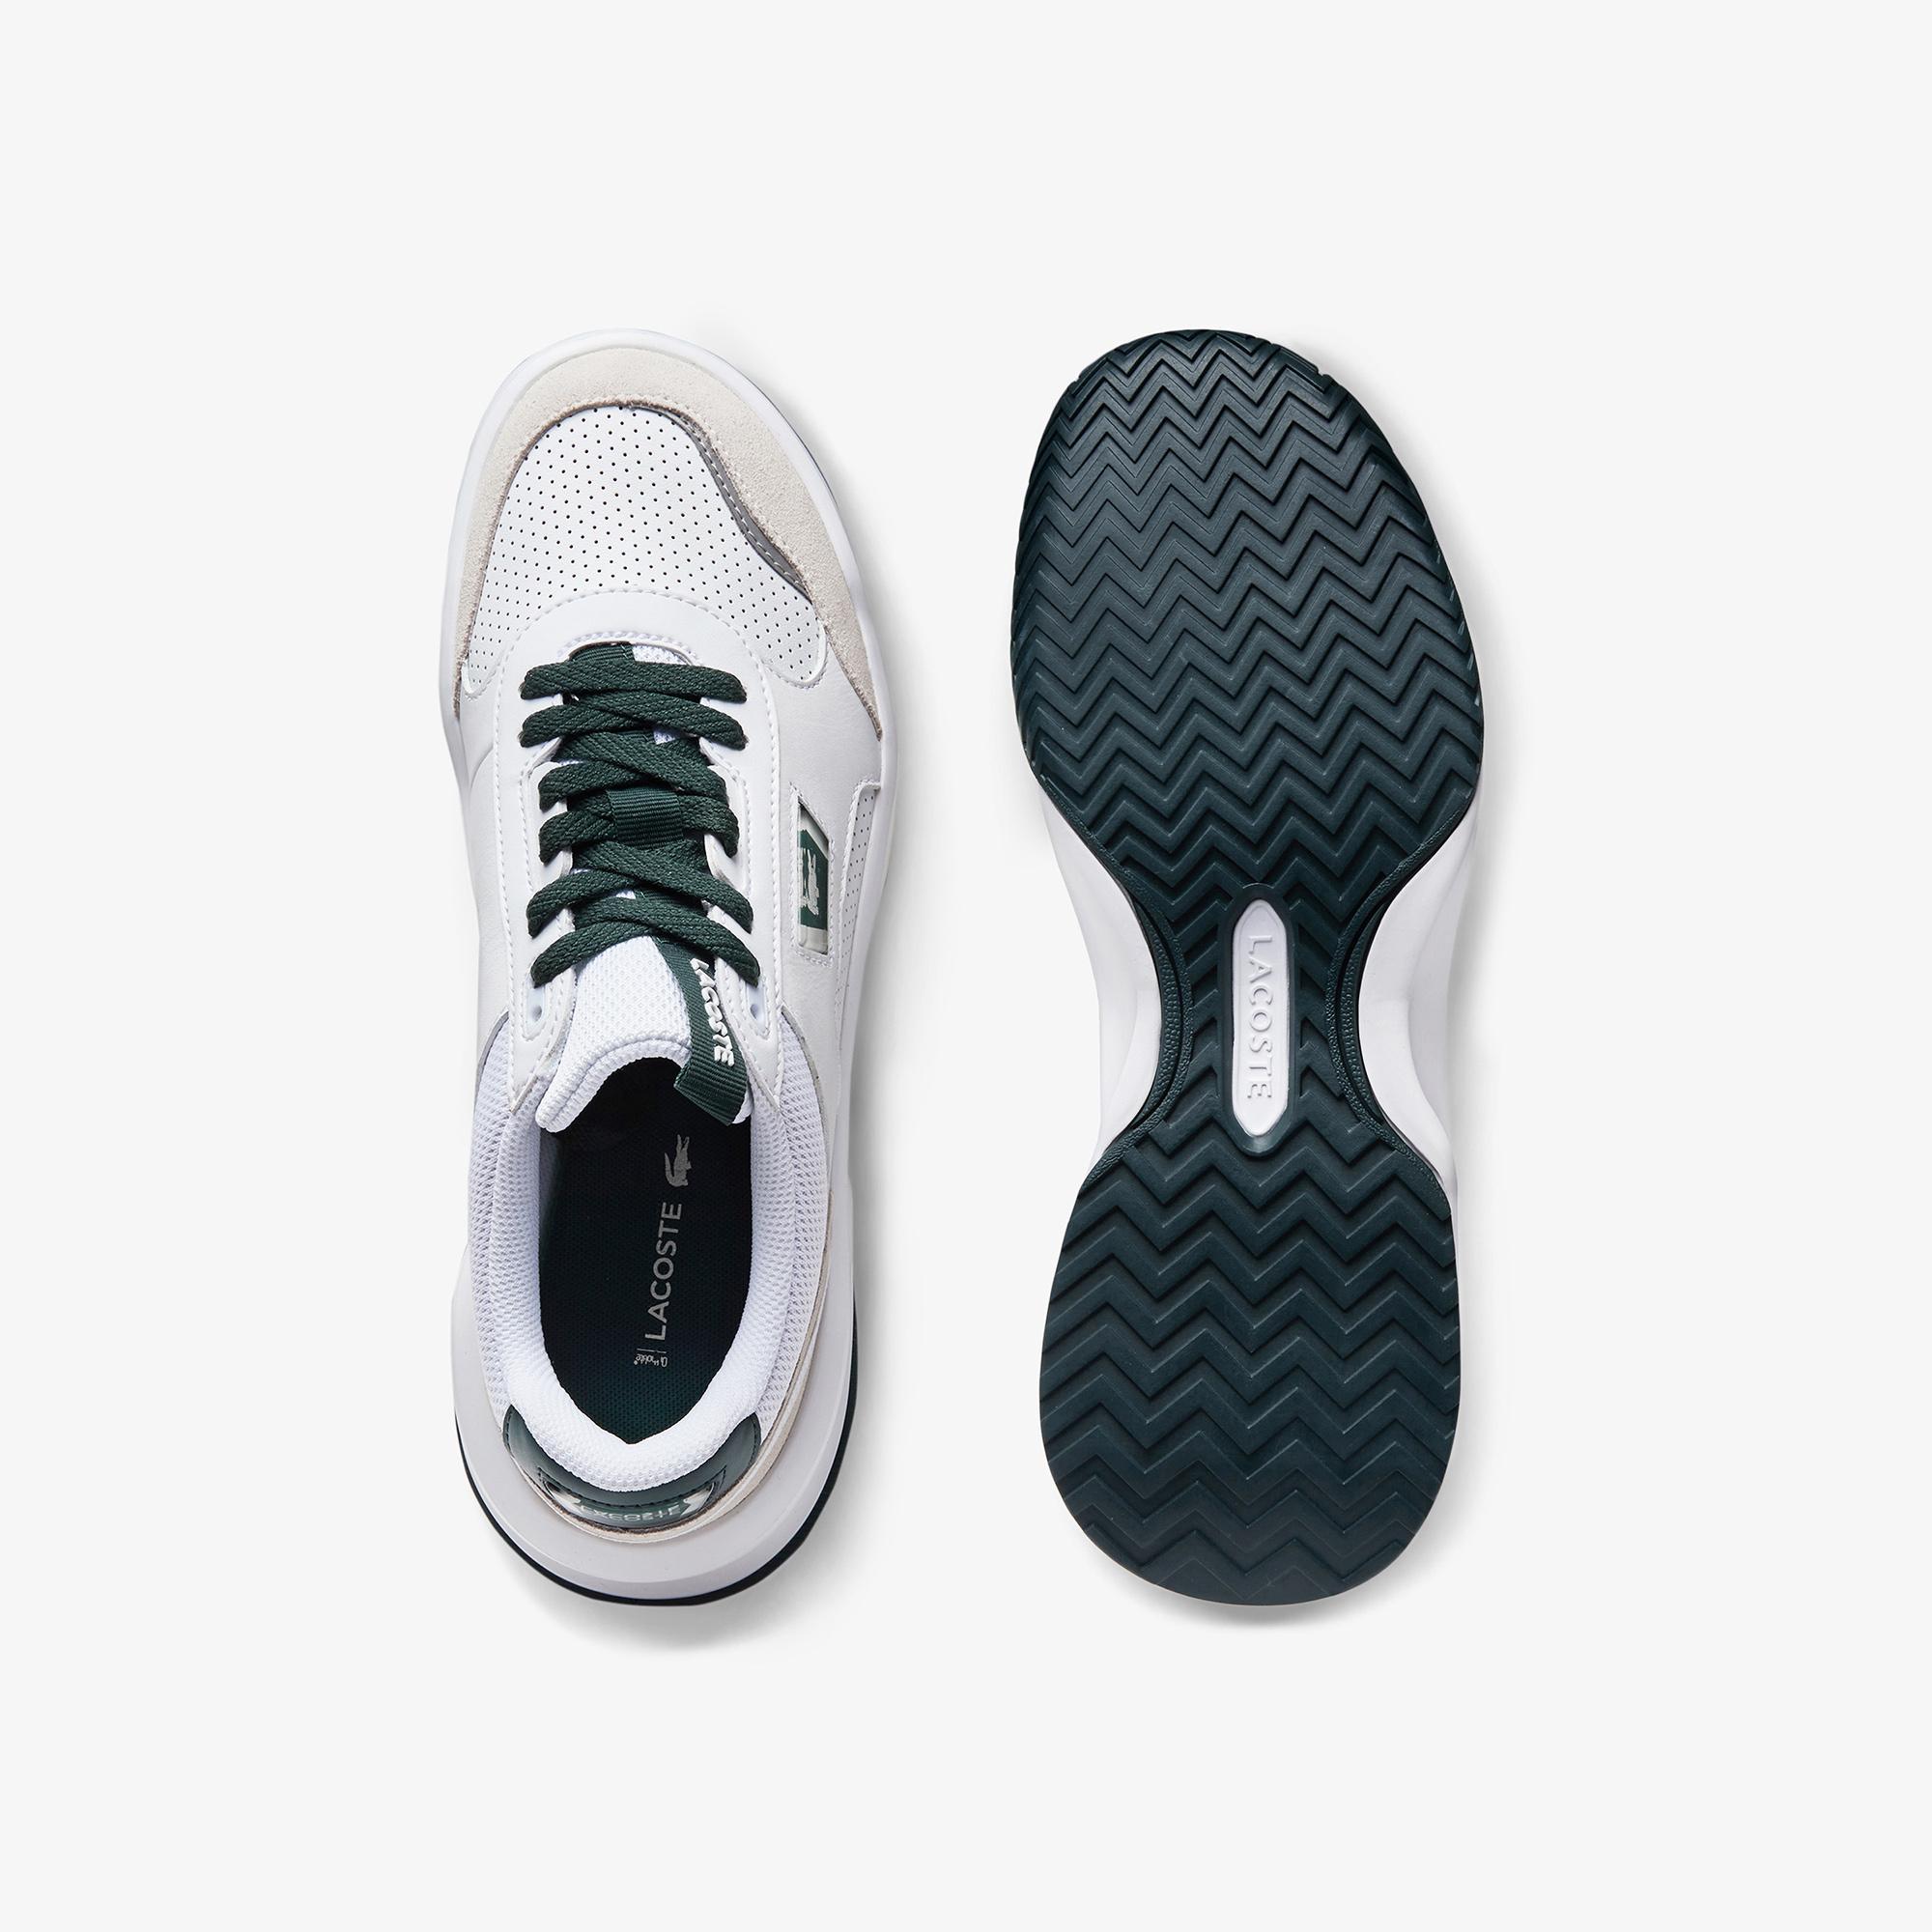 Lacoste Ace Lıft 0120 2 Sma Męskie Sneakersy